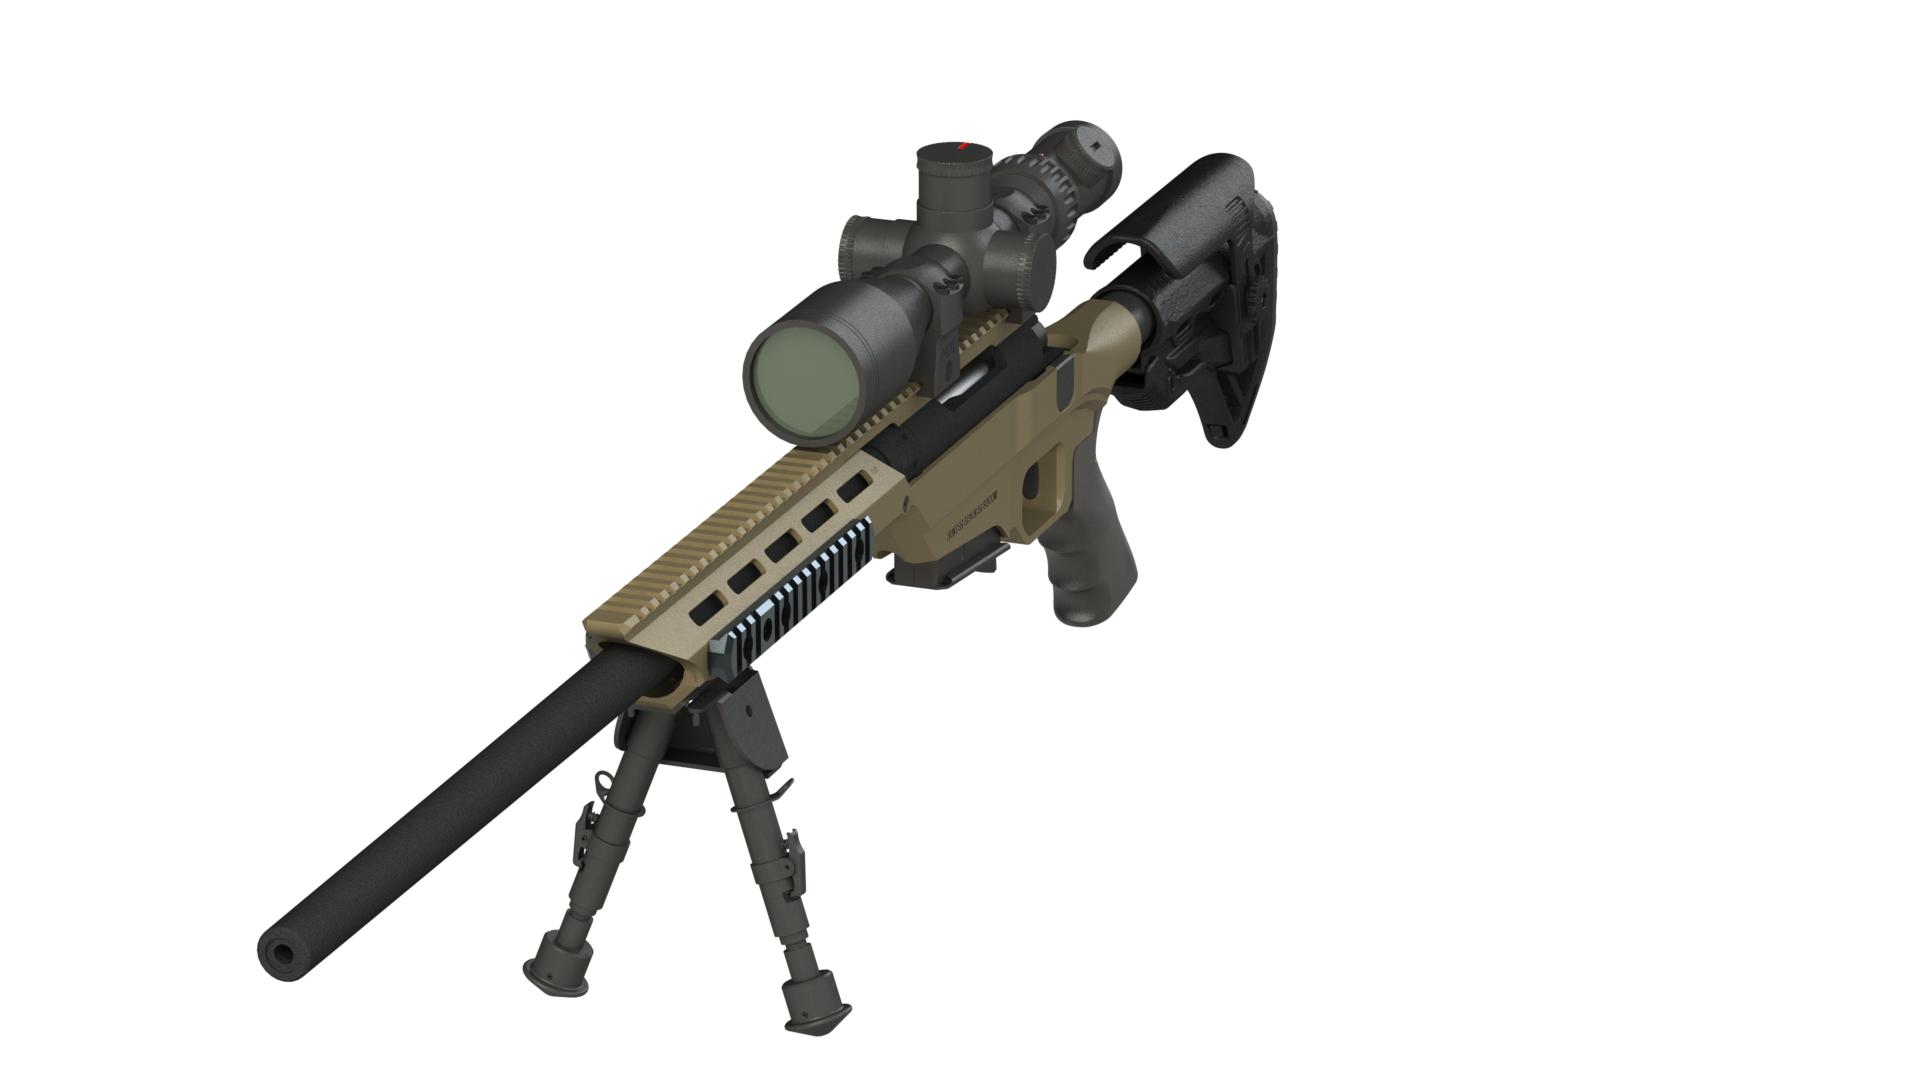 Png image purepng free. Gun clipart sniper